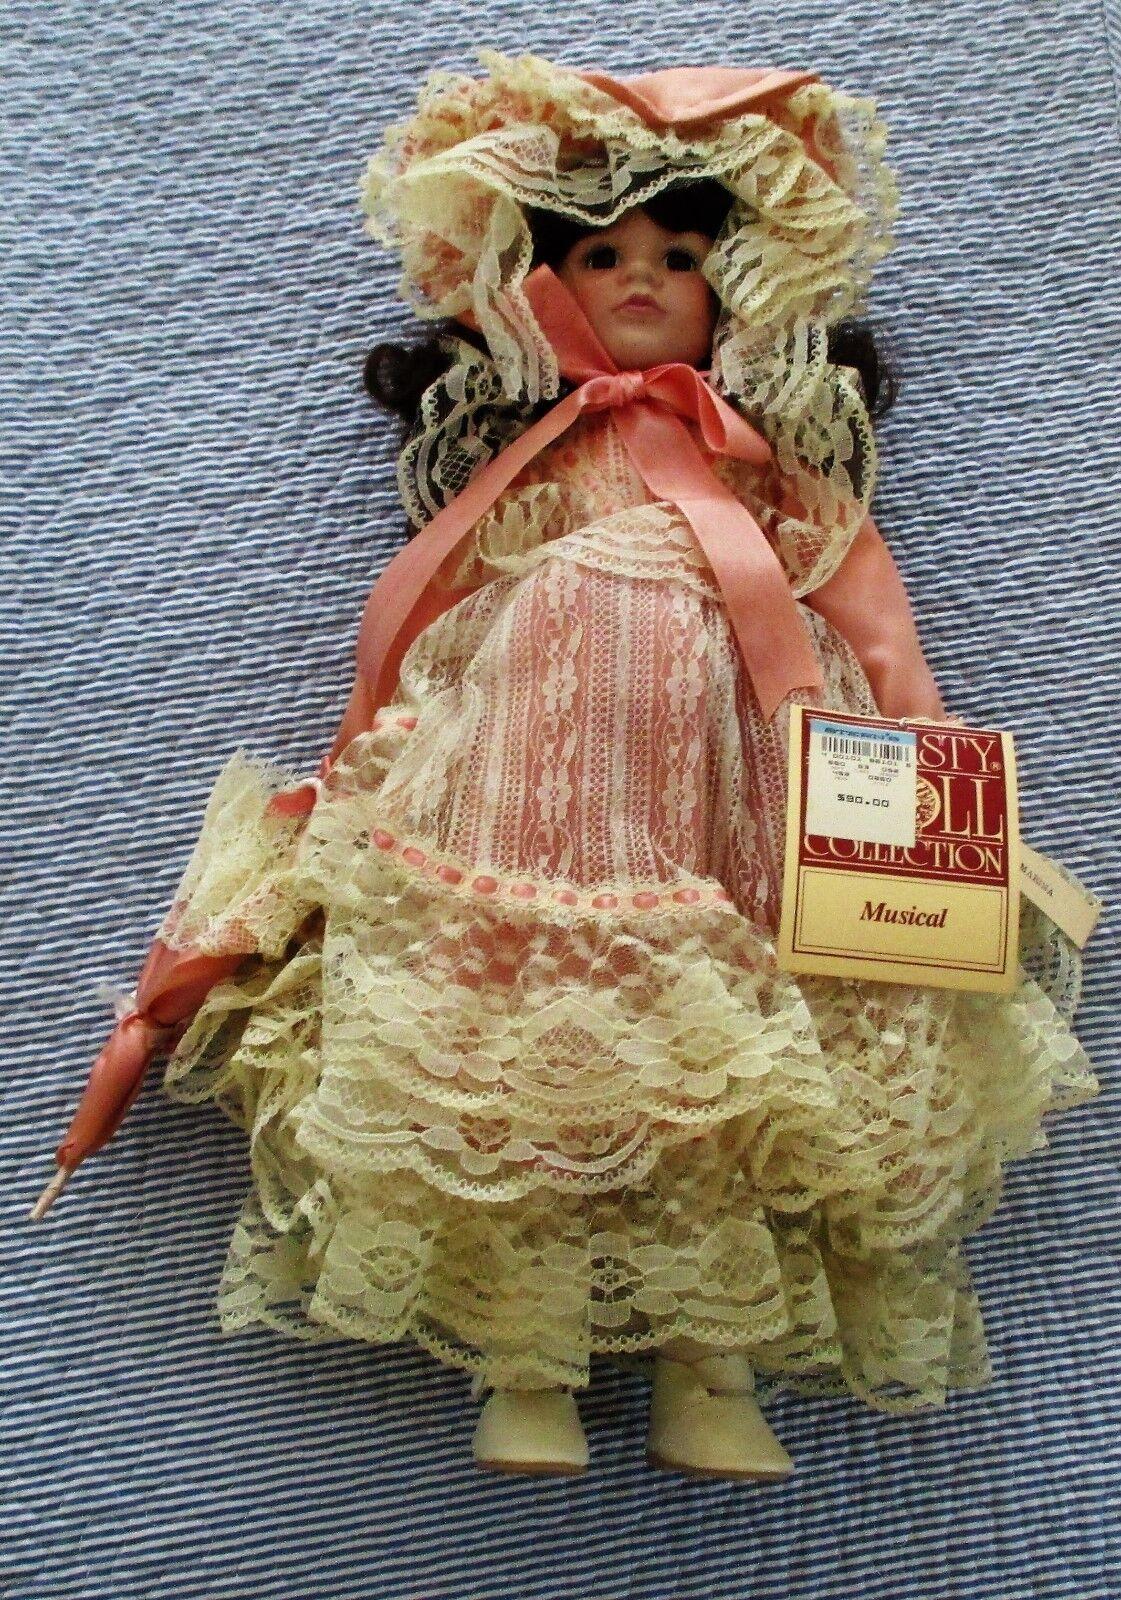 fabbrica diretta VINTAGE DYNASTY DYNASTY DYNASTY MUSICAL PORCELAIN bambola.  MARINA . W  COA & ORIGINAL scatola & STe.  ecco l'ultimo